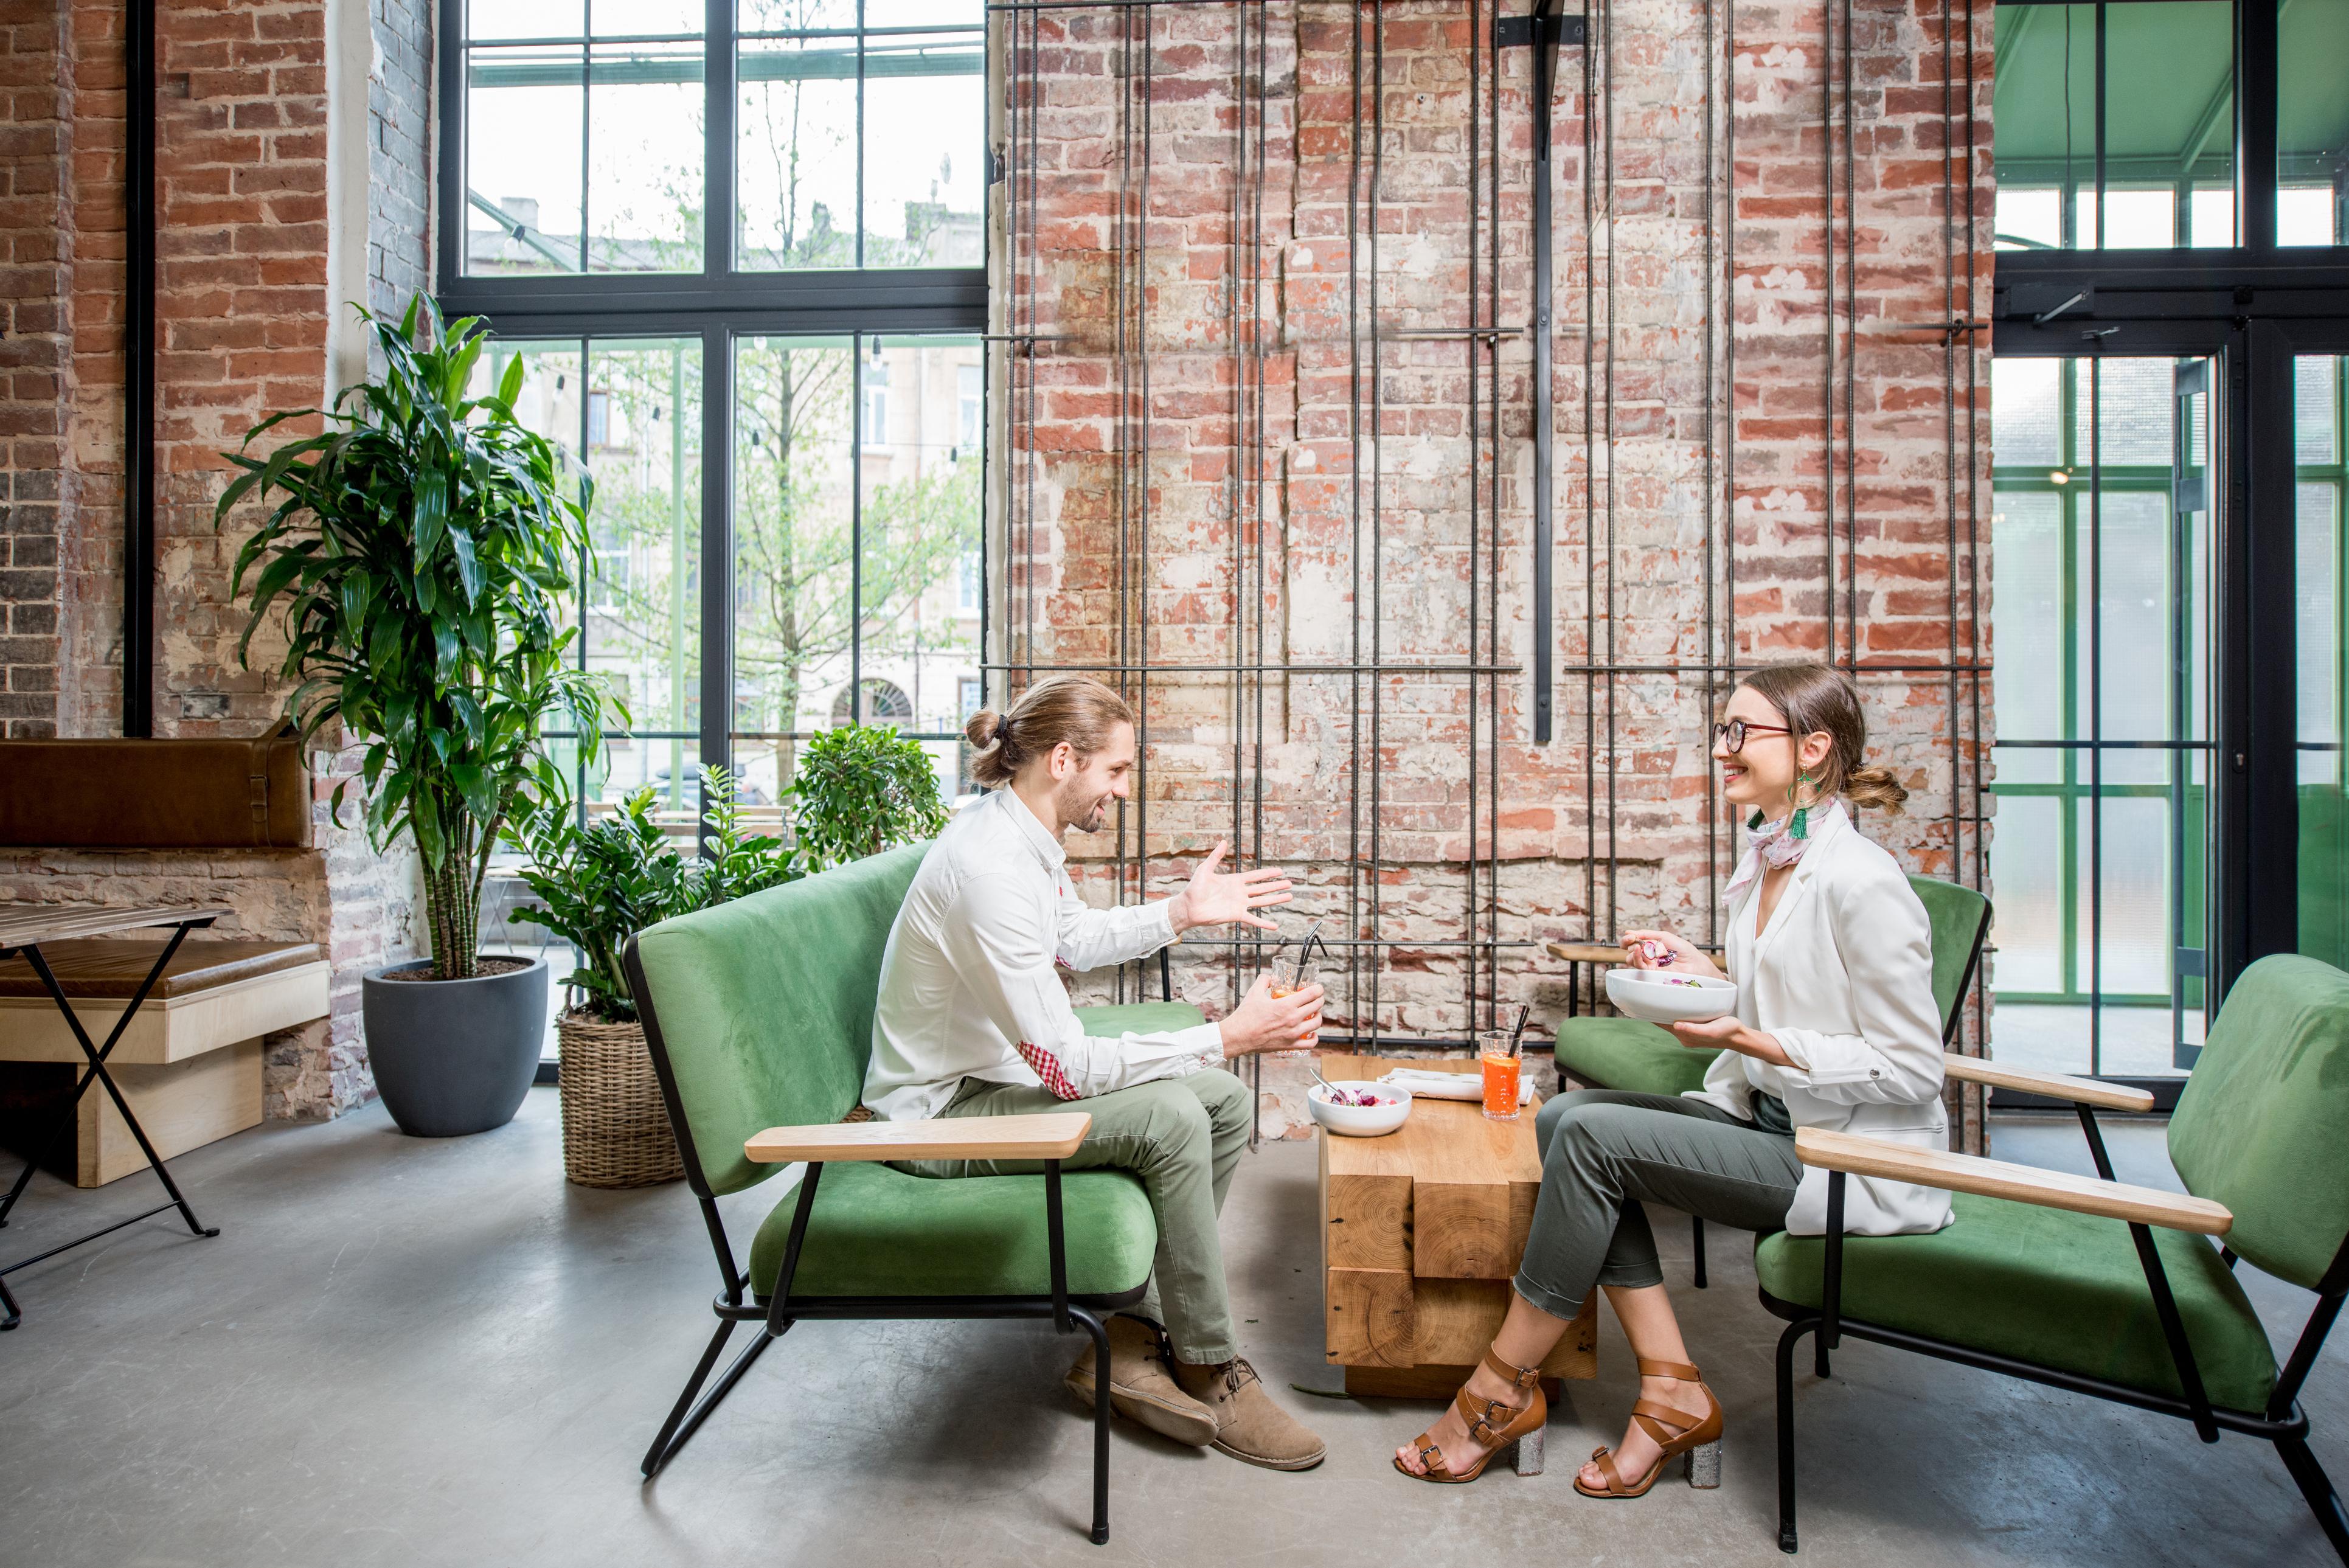 Office design ideas to attract Millennials